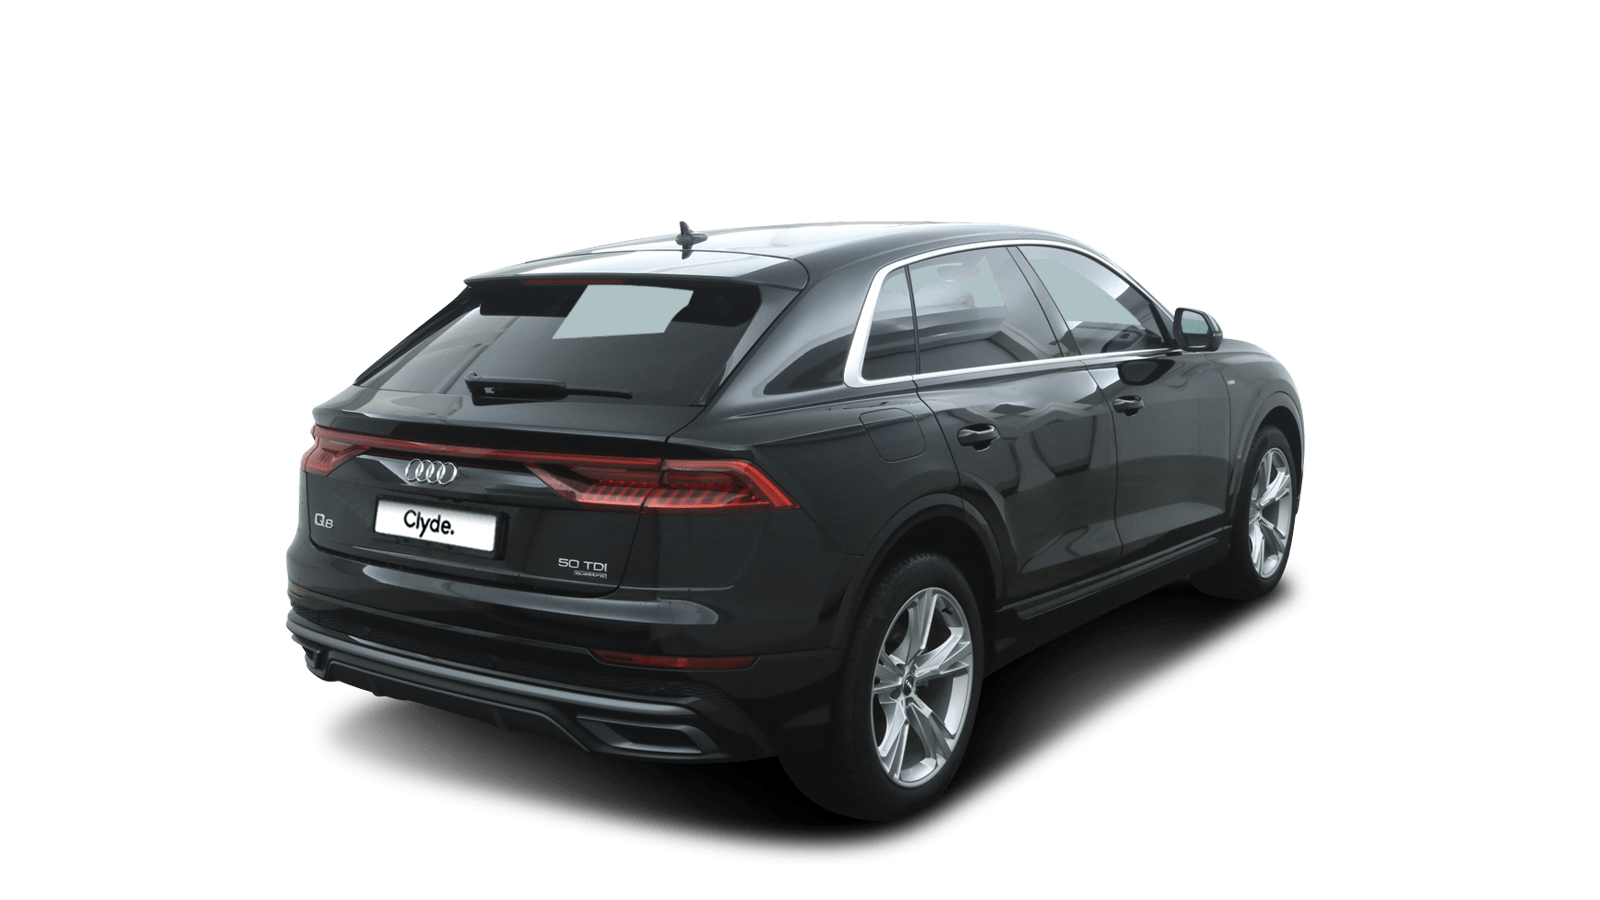 Audi Q8 Black back - Clyde car subscription